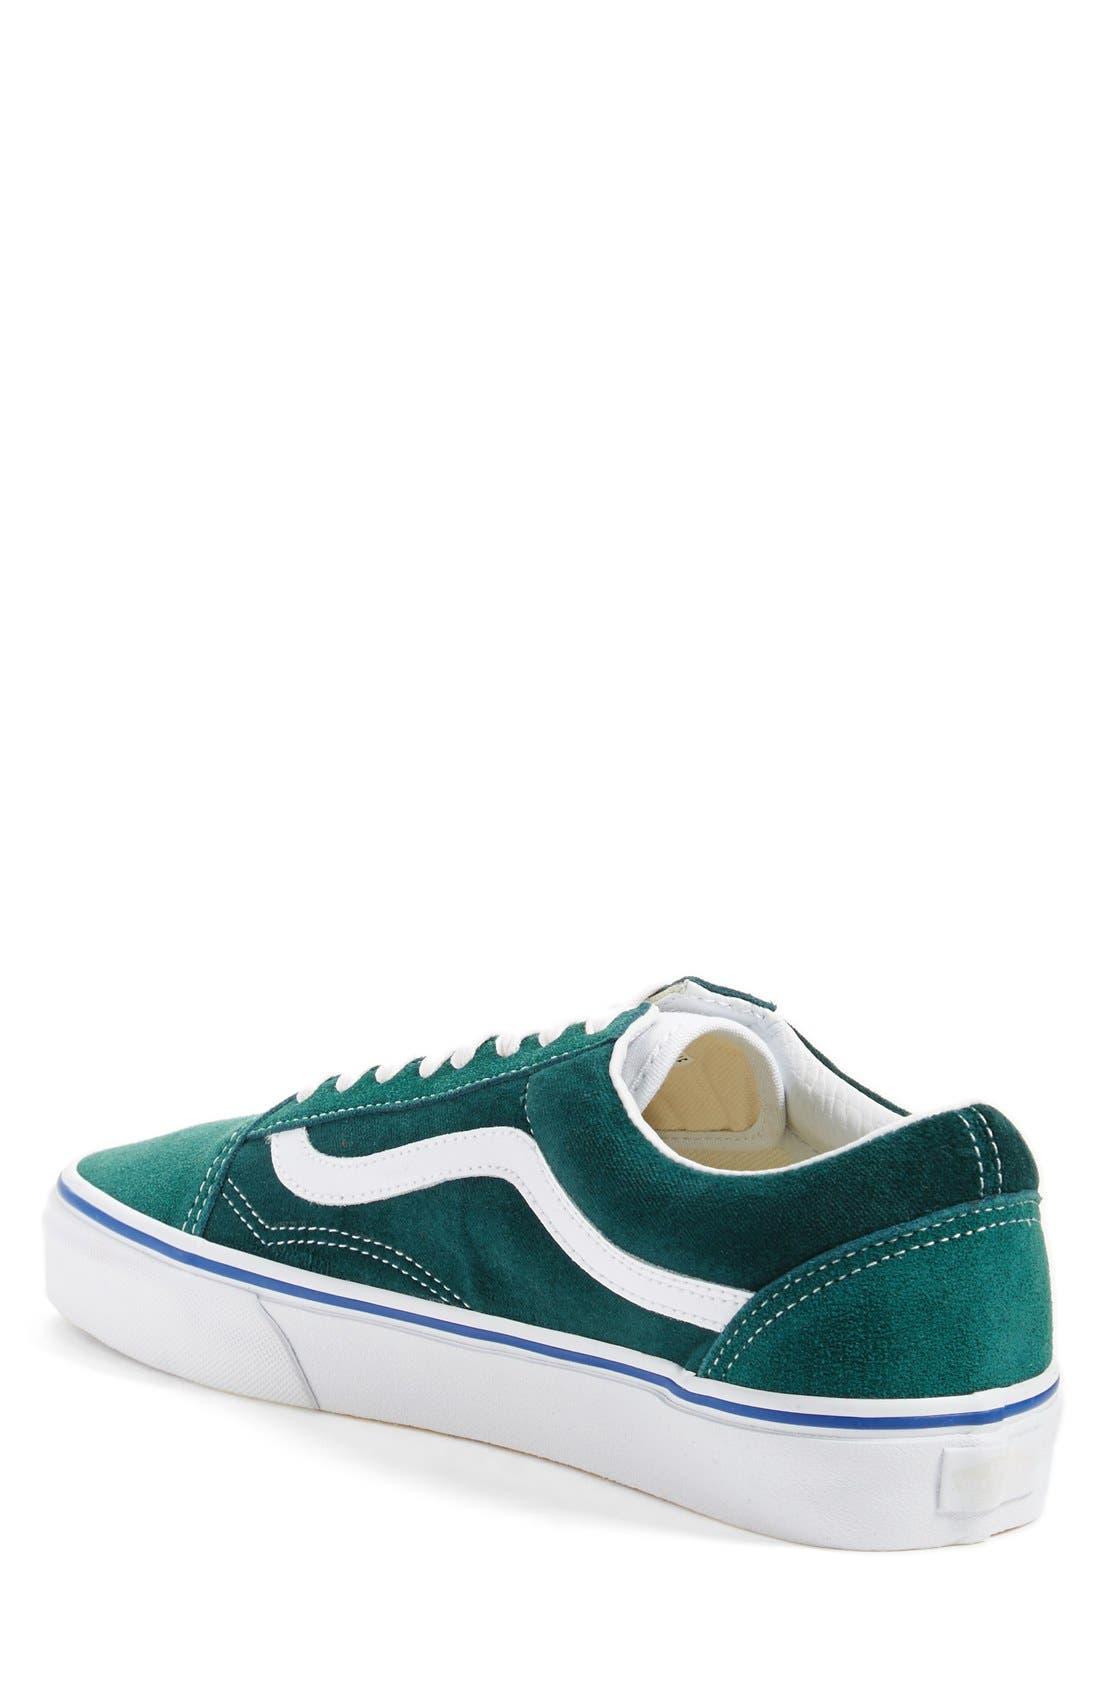 Alternate Image 3  - Vans 'Old Skool' Velvet Sneaker (Men) (Nordstrom Exclusive)